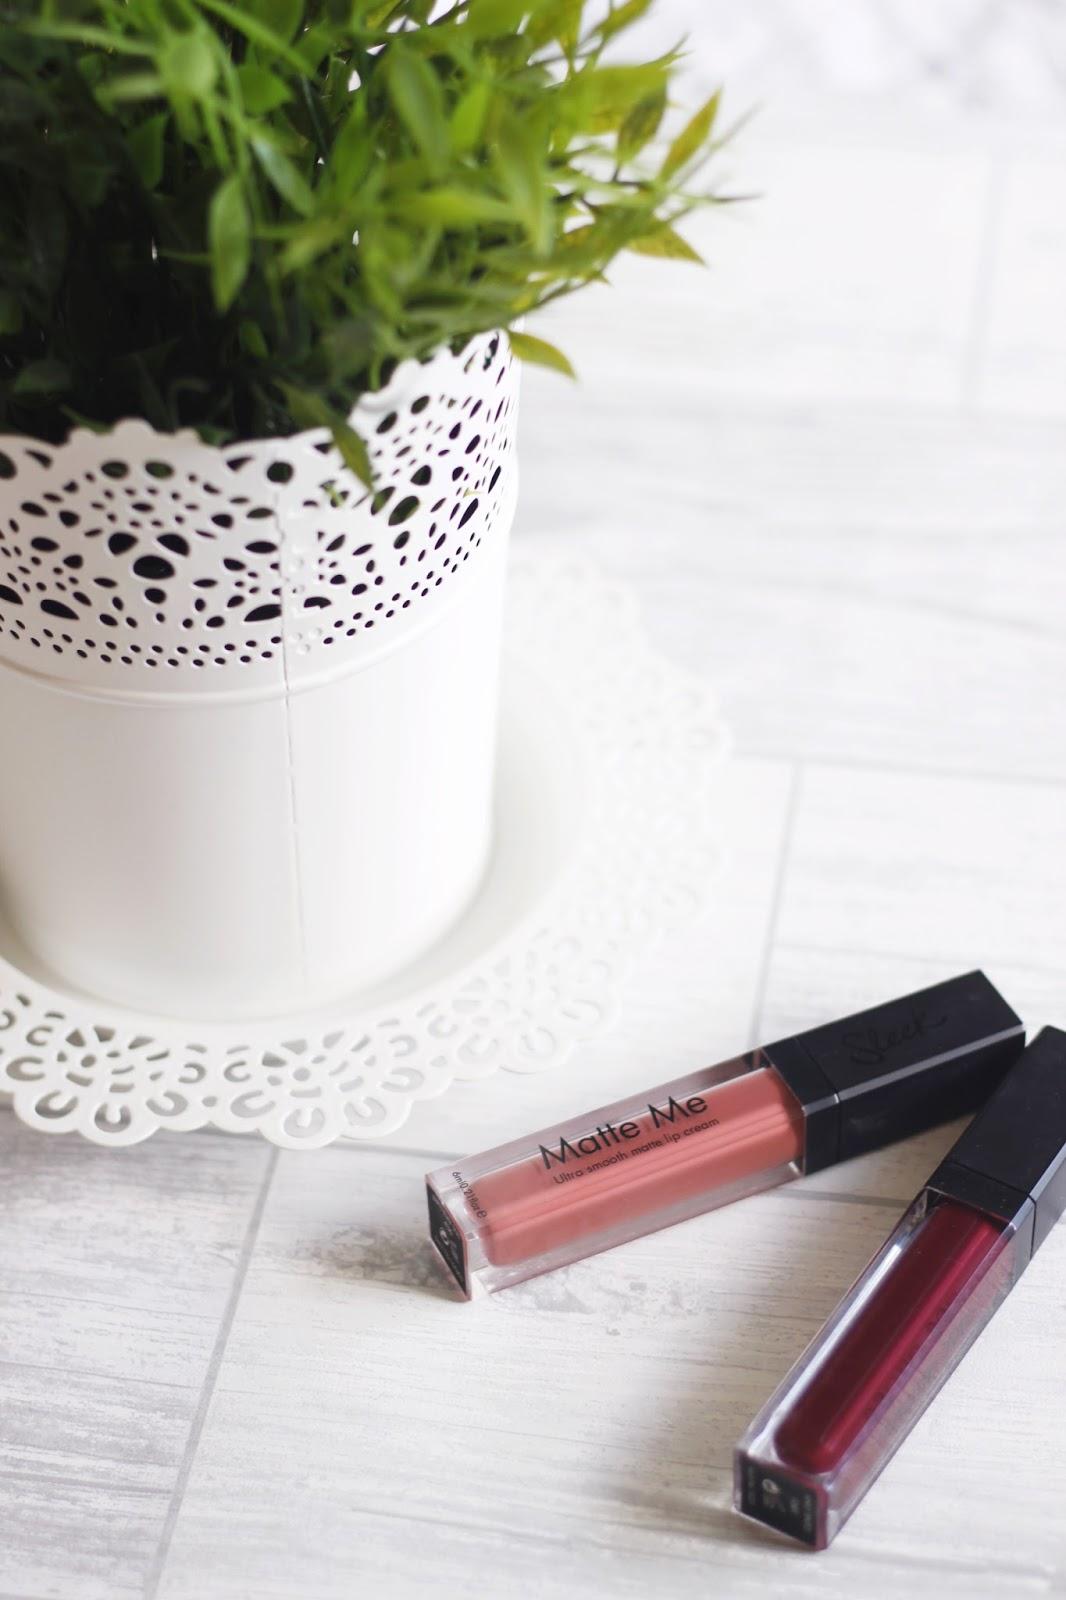 See The Stars - Sleek Matte Lip Cream Review